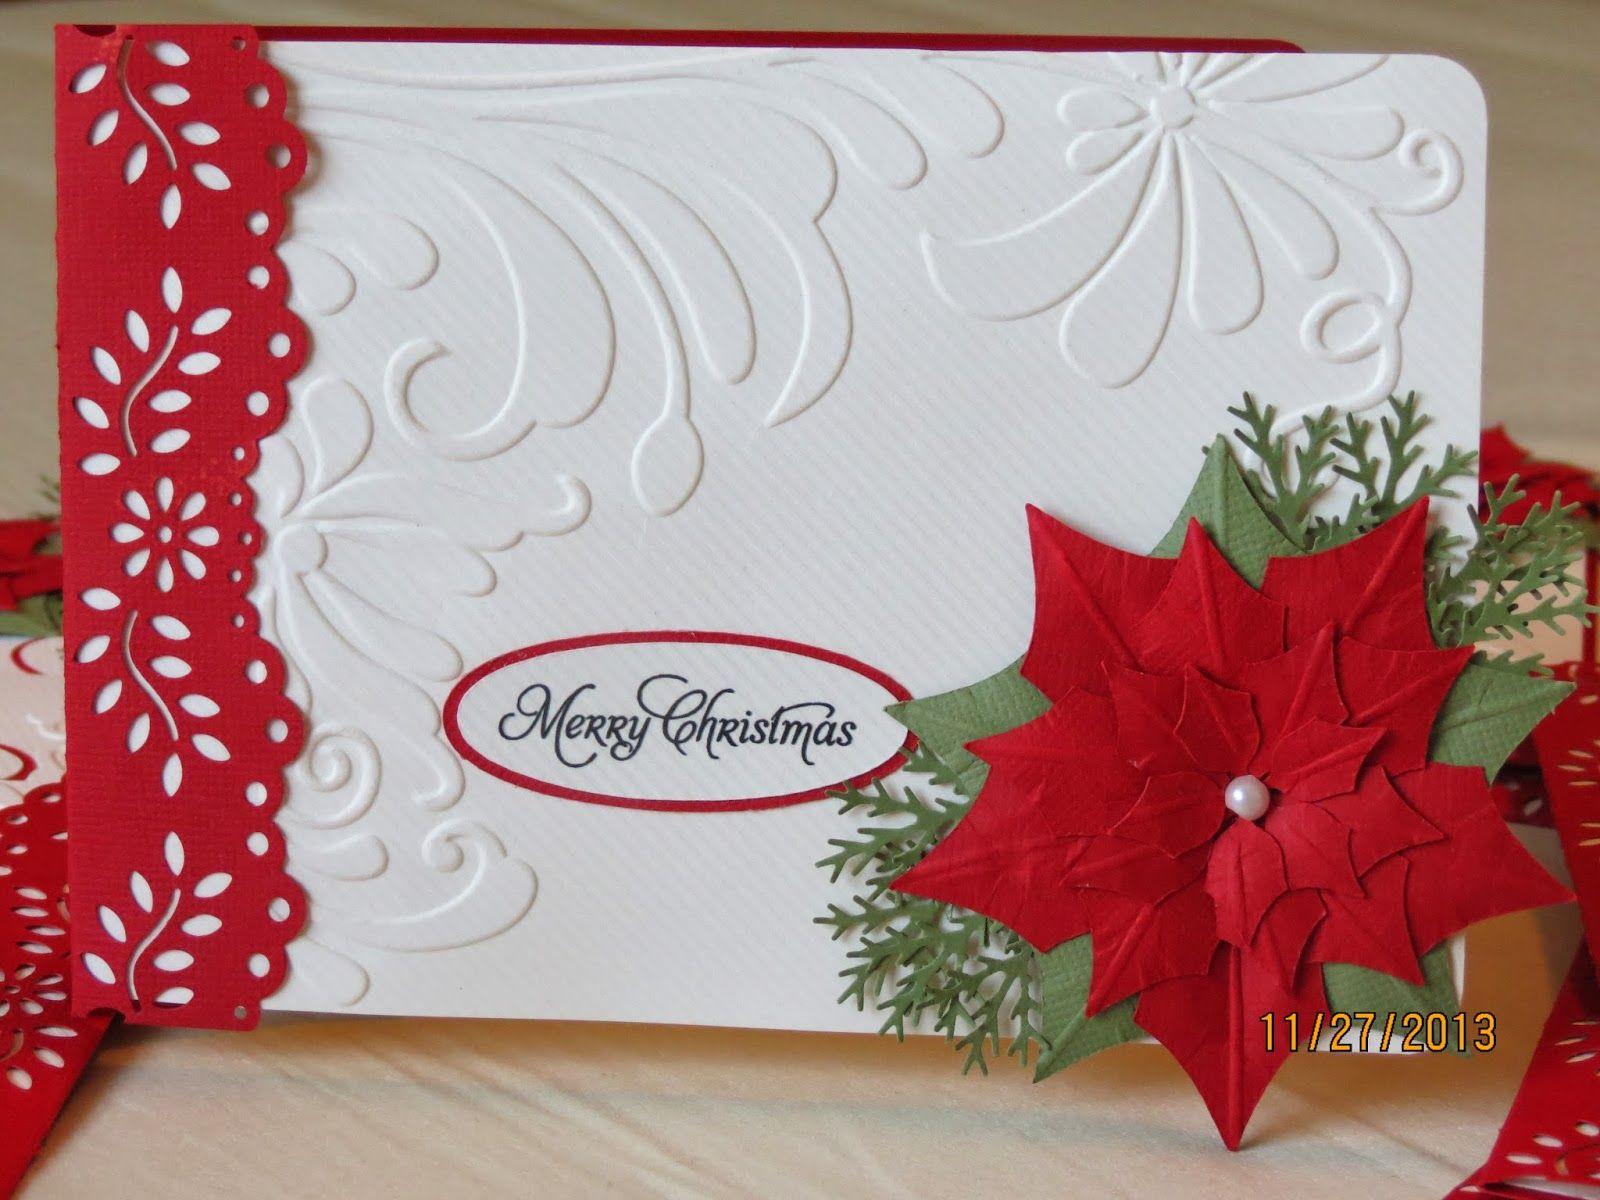 Ligaya's Creativity Zone: Christmas Card 2013